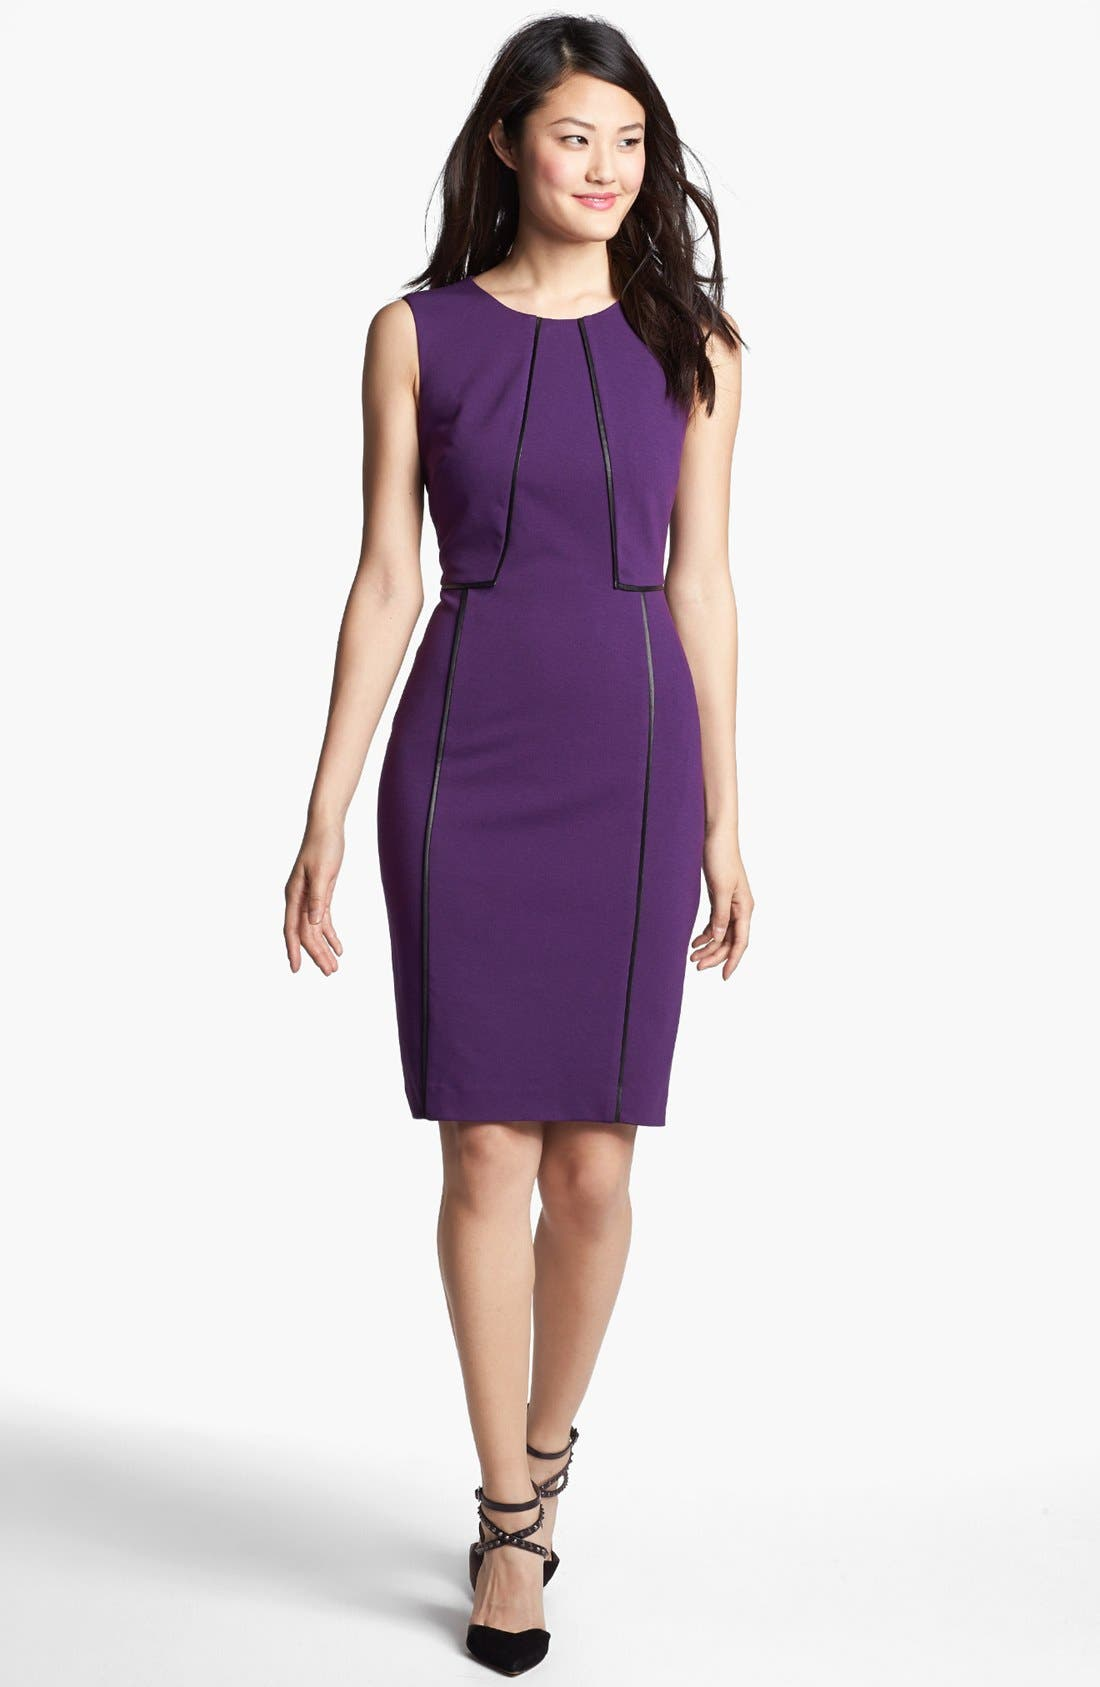 Alternate Image 1 Selected - Halogen® Faux Leather Trim Sheath Dress (Online Only)